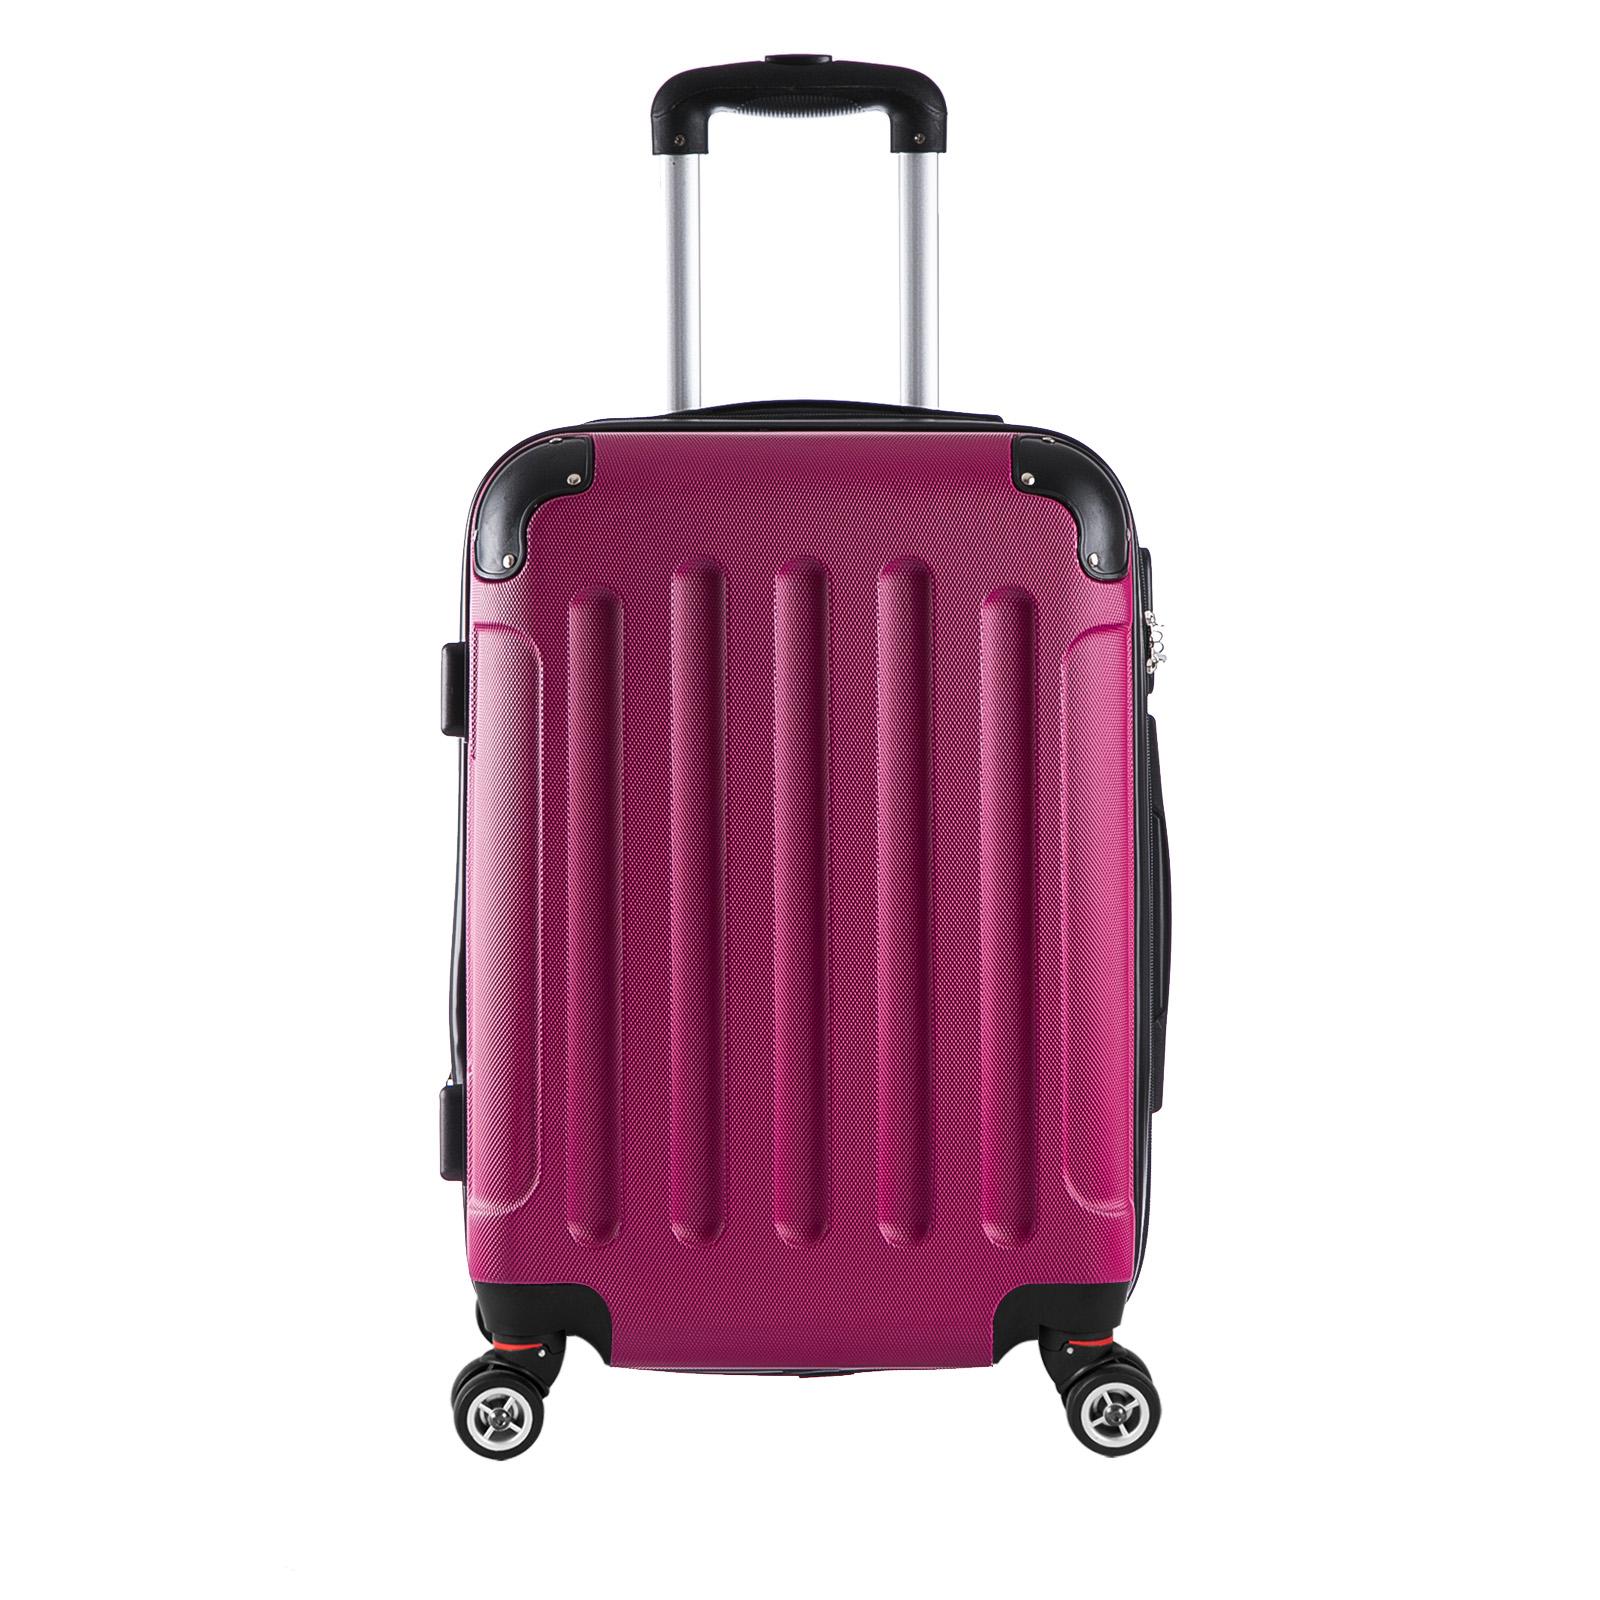 reisekoffer trolley hartschalen reise koffer mit 4 rollen pink l rk4204pk l ebay. Black Bedroom Furniture Sets. Home Design Ideas